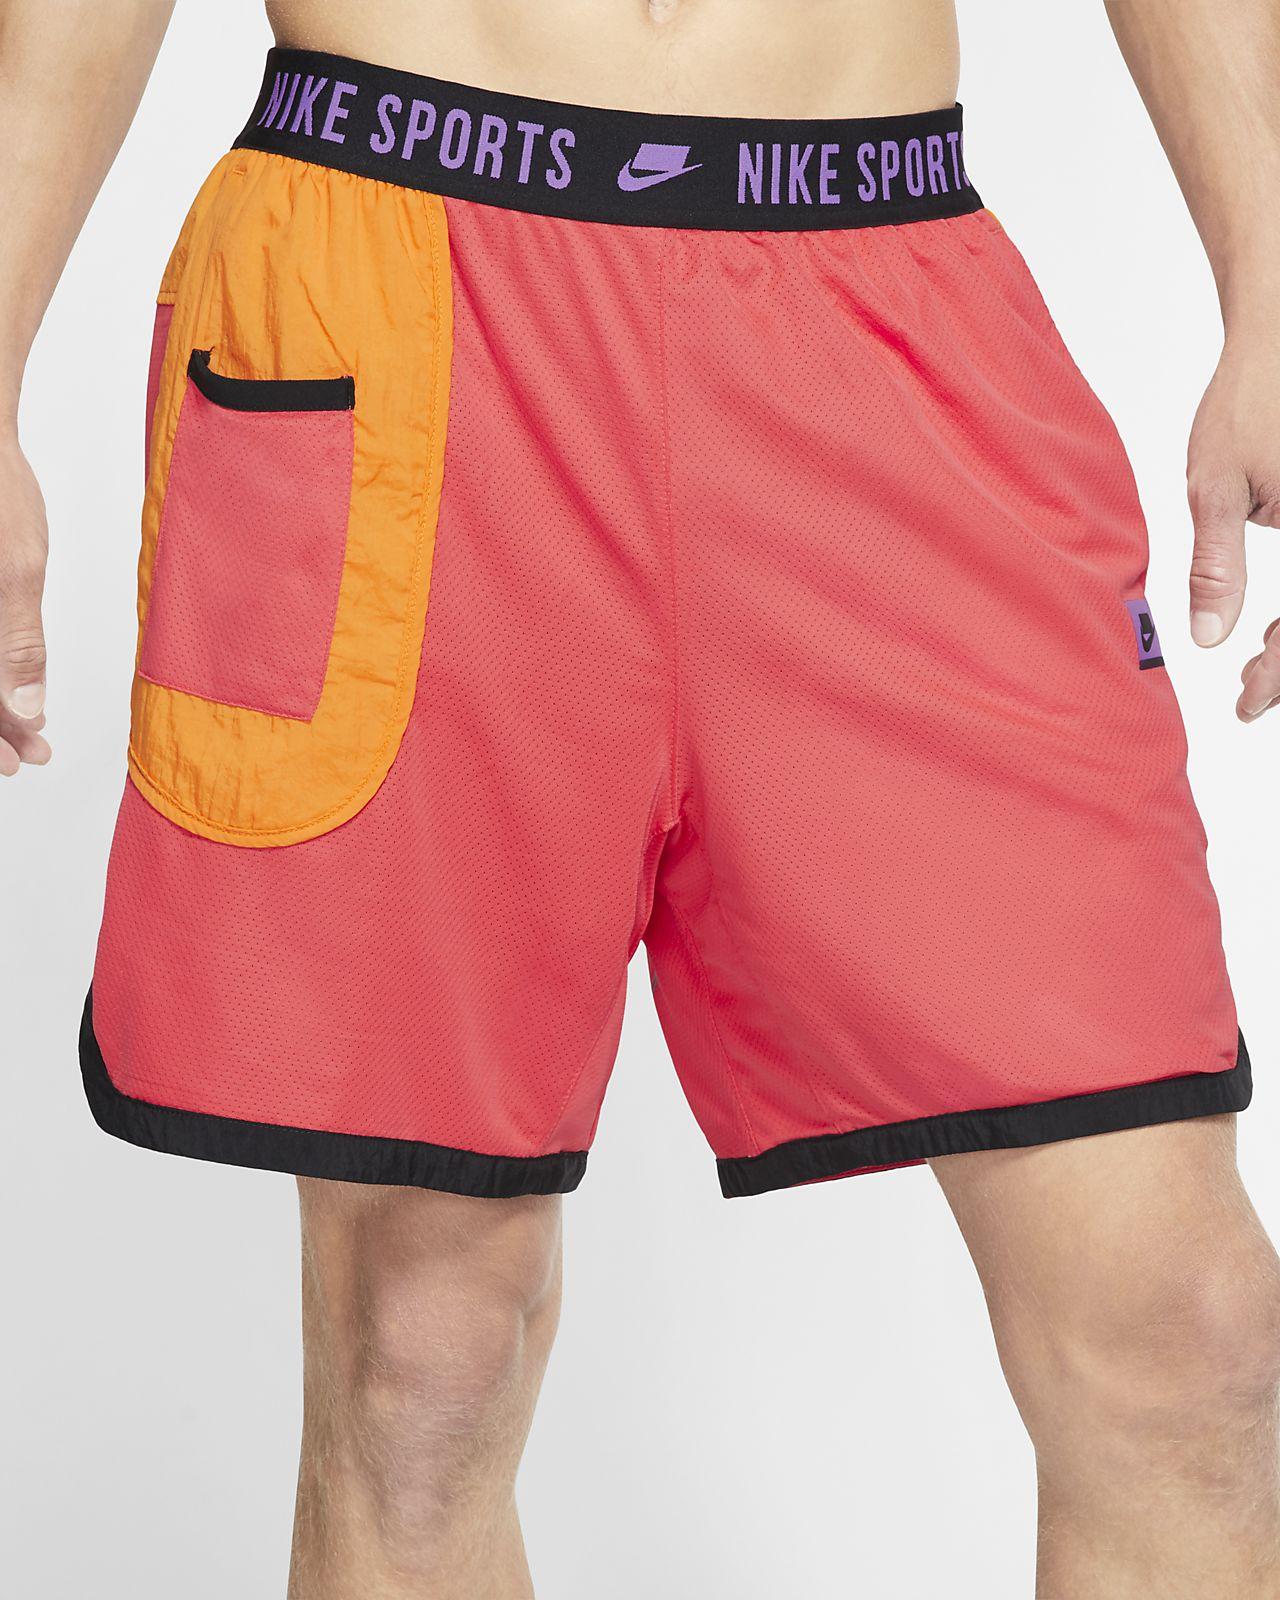 Nike Dri-FIT Sport Clash Men's Training Shorts